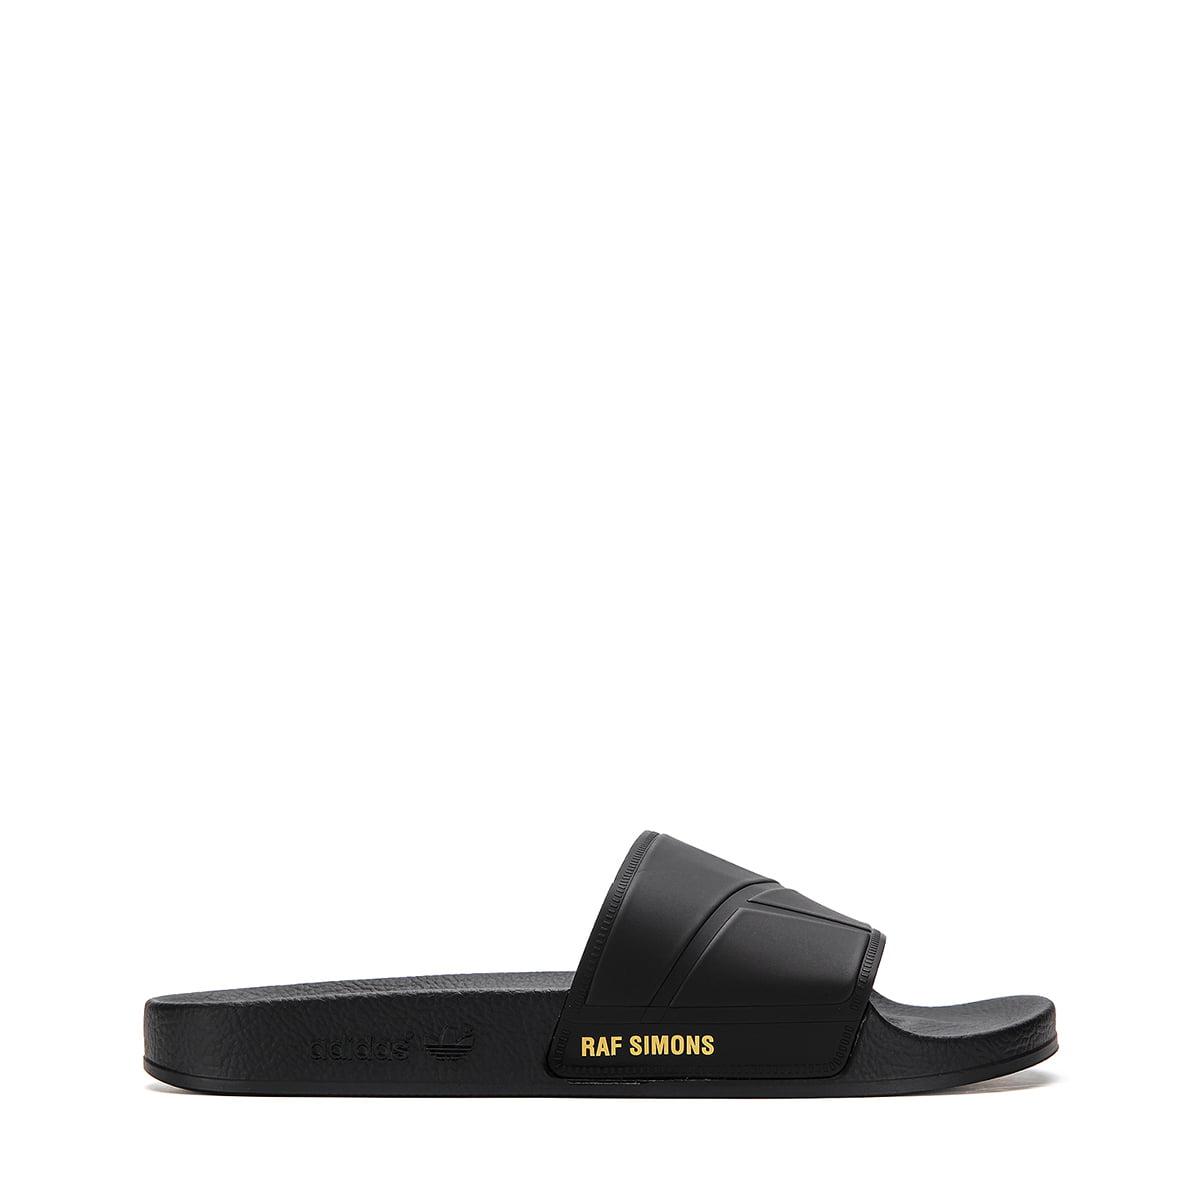 Adidas x Raf Simons Adilette Bunny Slide Sandals BY9813 C...